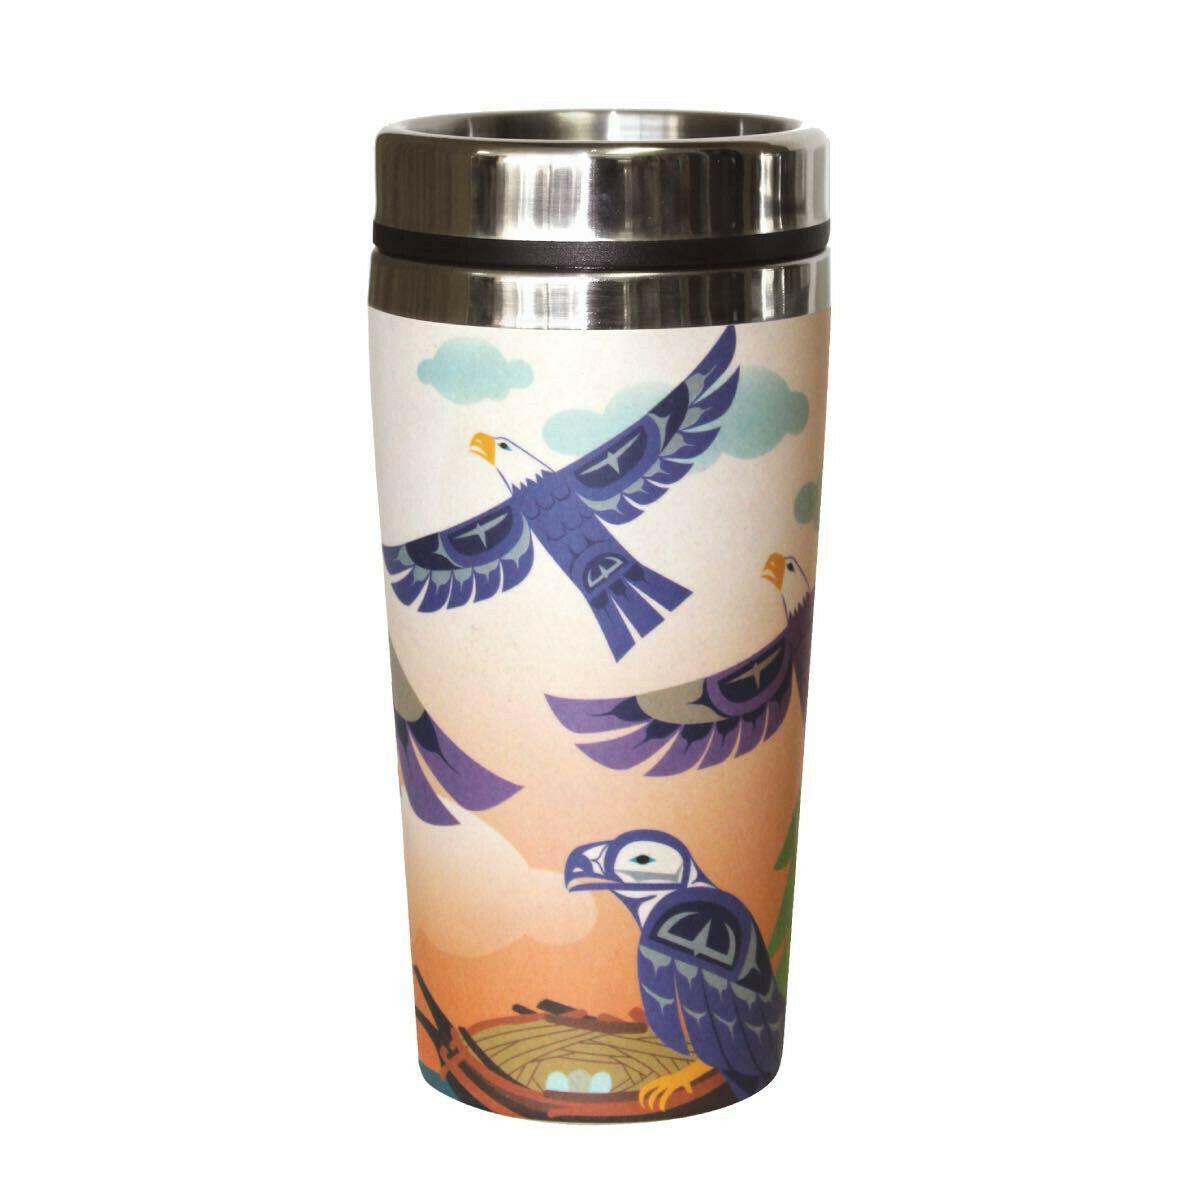 Bamboo Travel Mug - Eagle Family